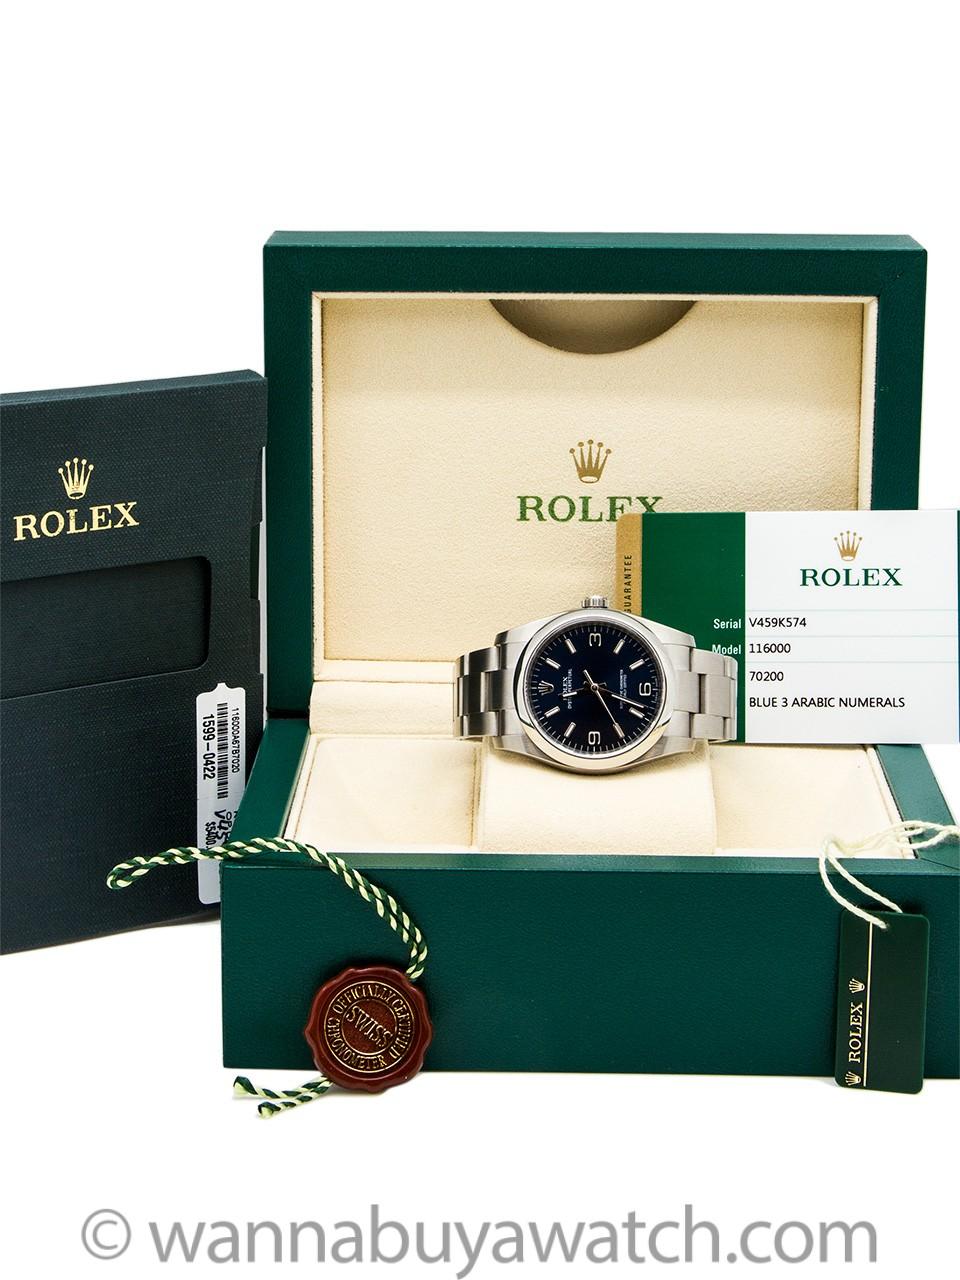 Rolex Oyster Perpetual ref 116000  B & P circa 2016